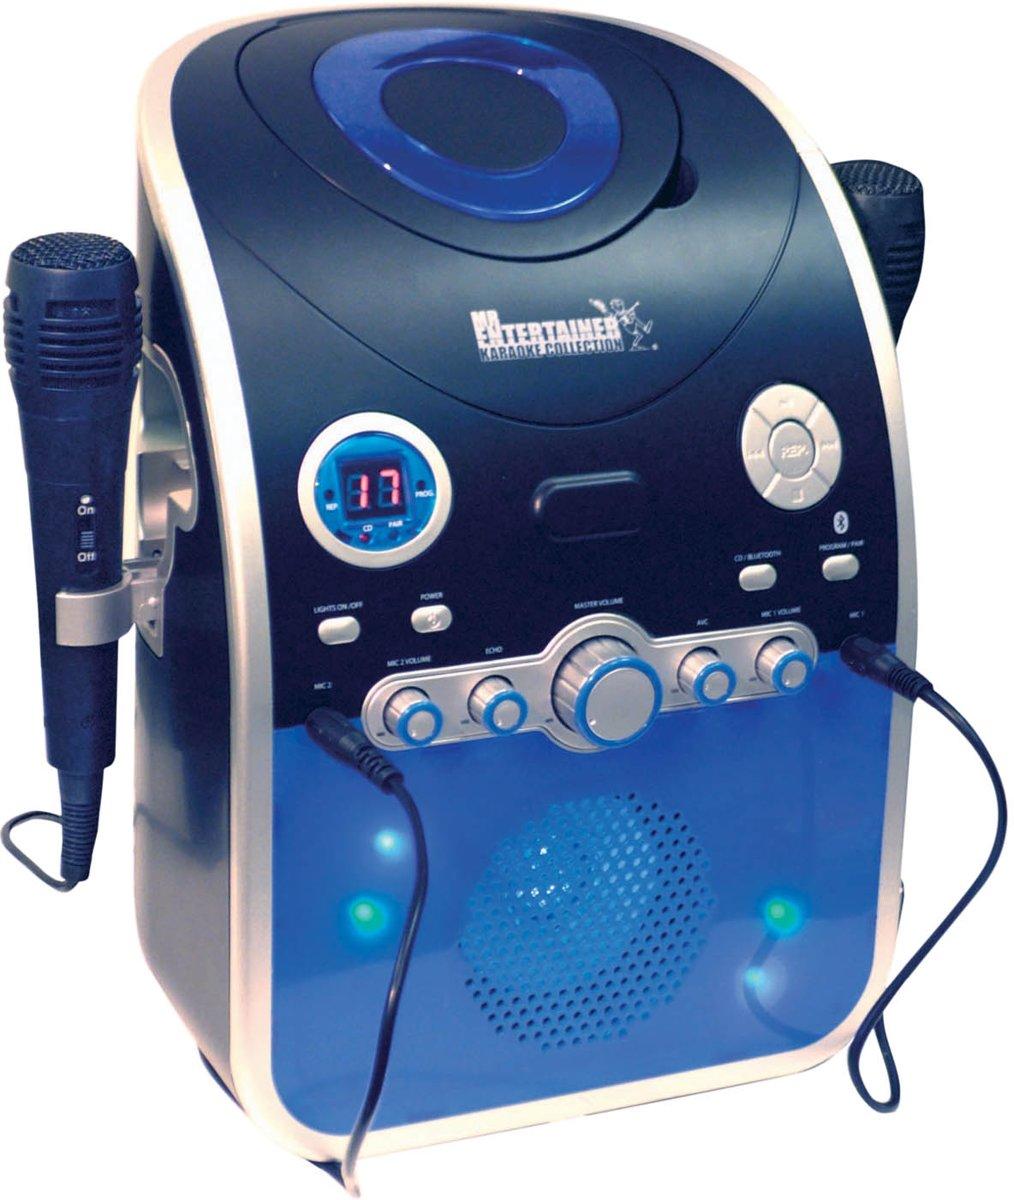 Karaoke Machine CDG met Bluetooth en disco LED verlichting